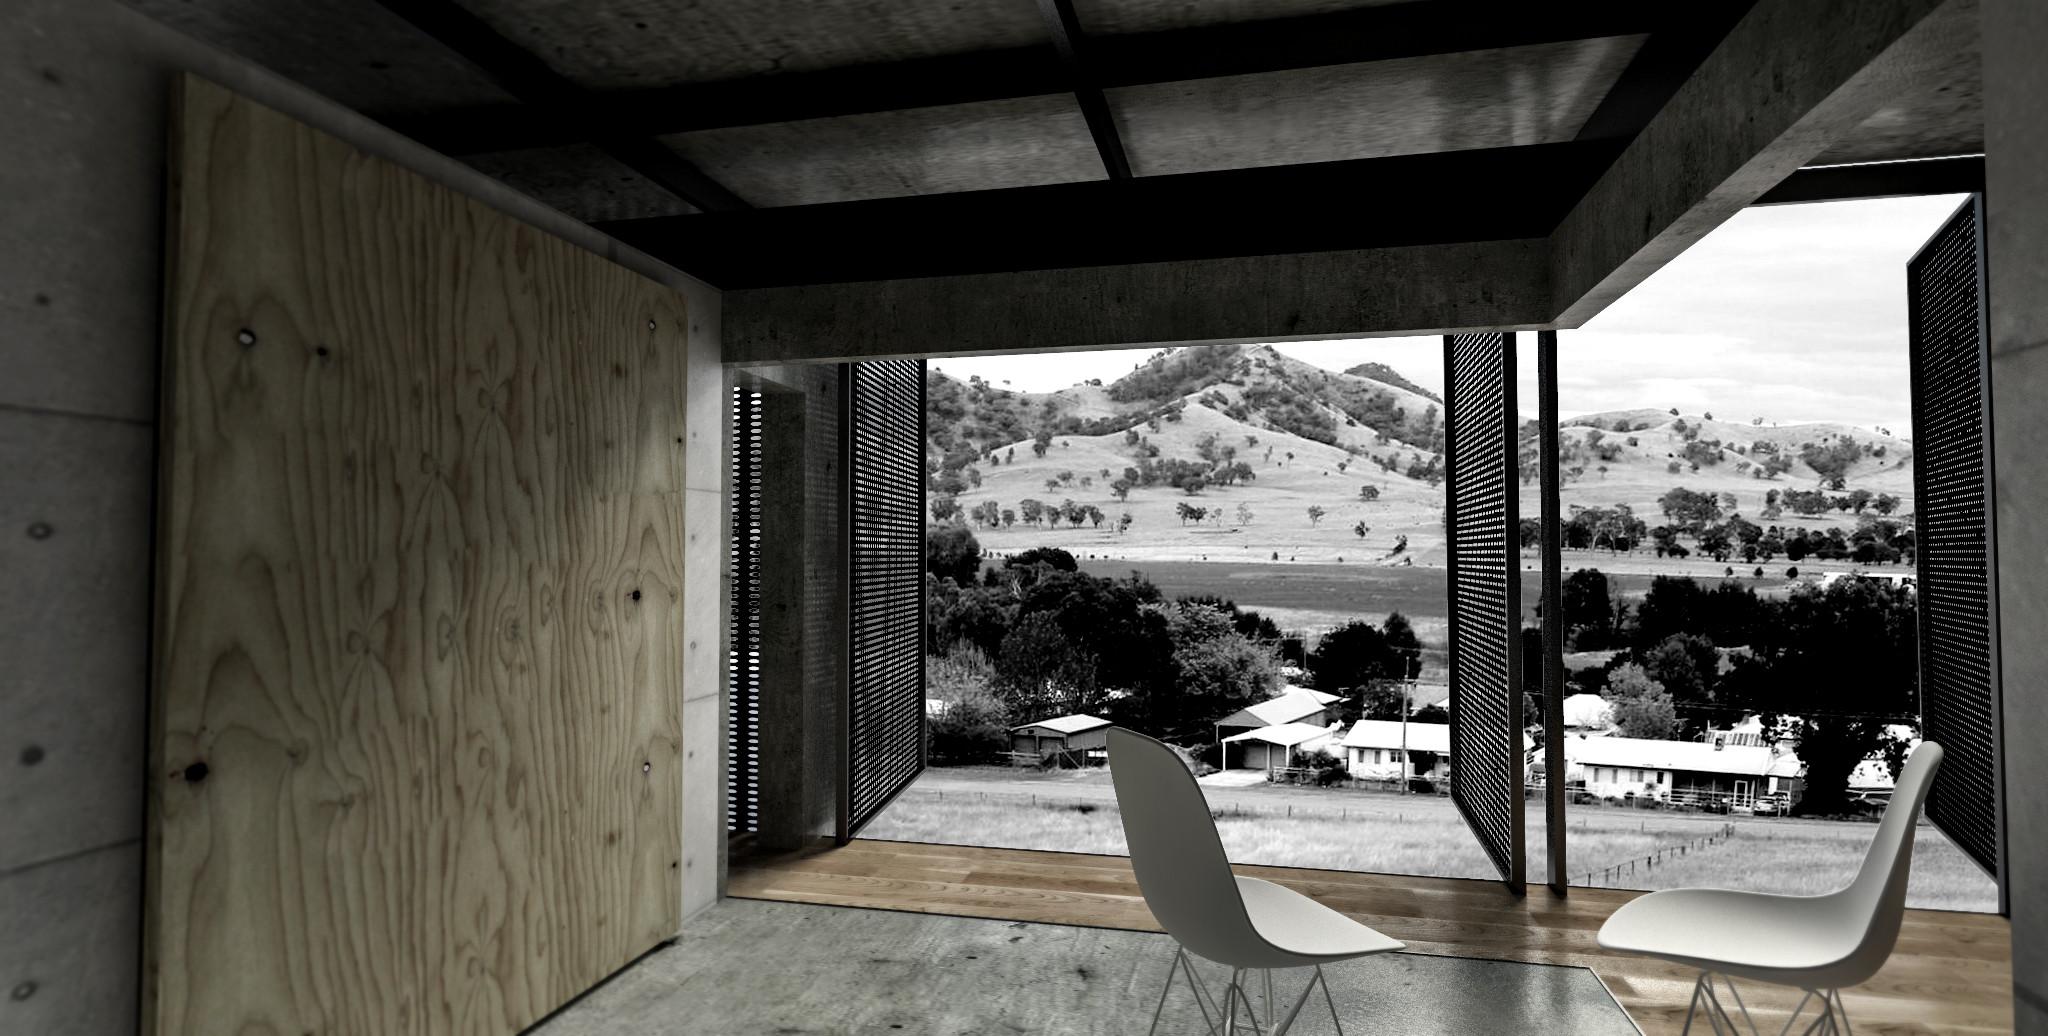 Nundle Interior render 2.jpg